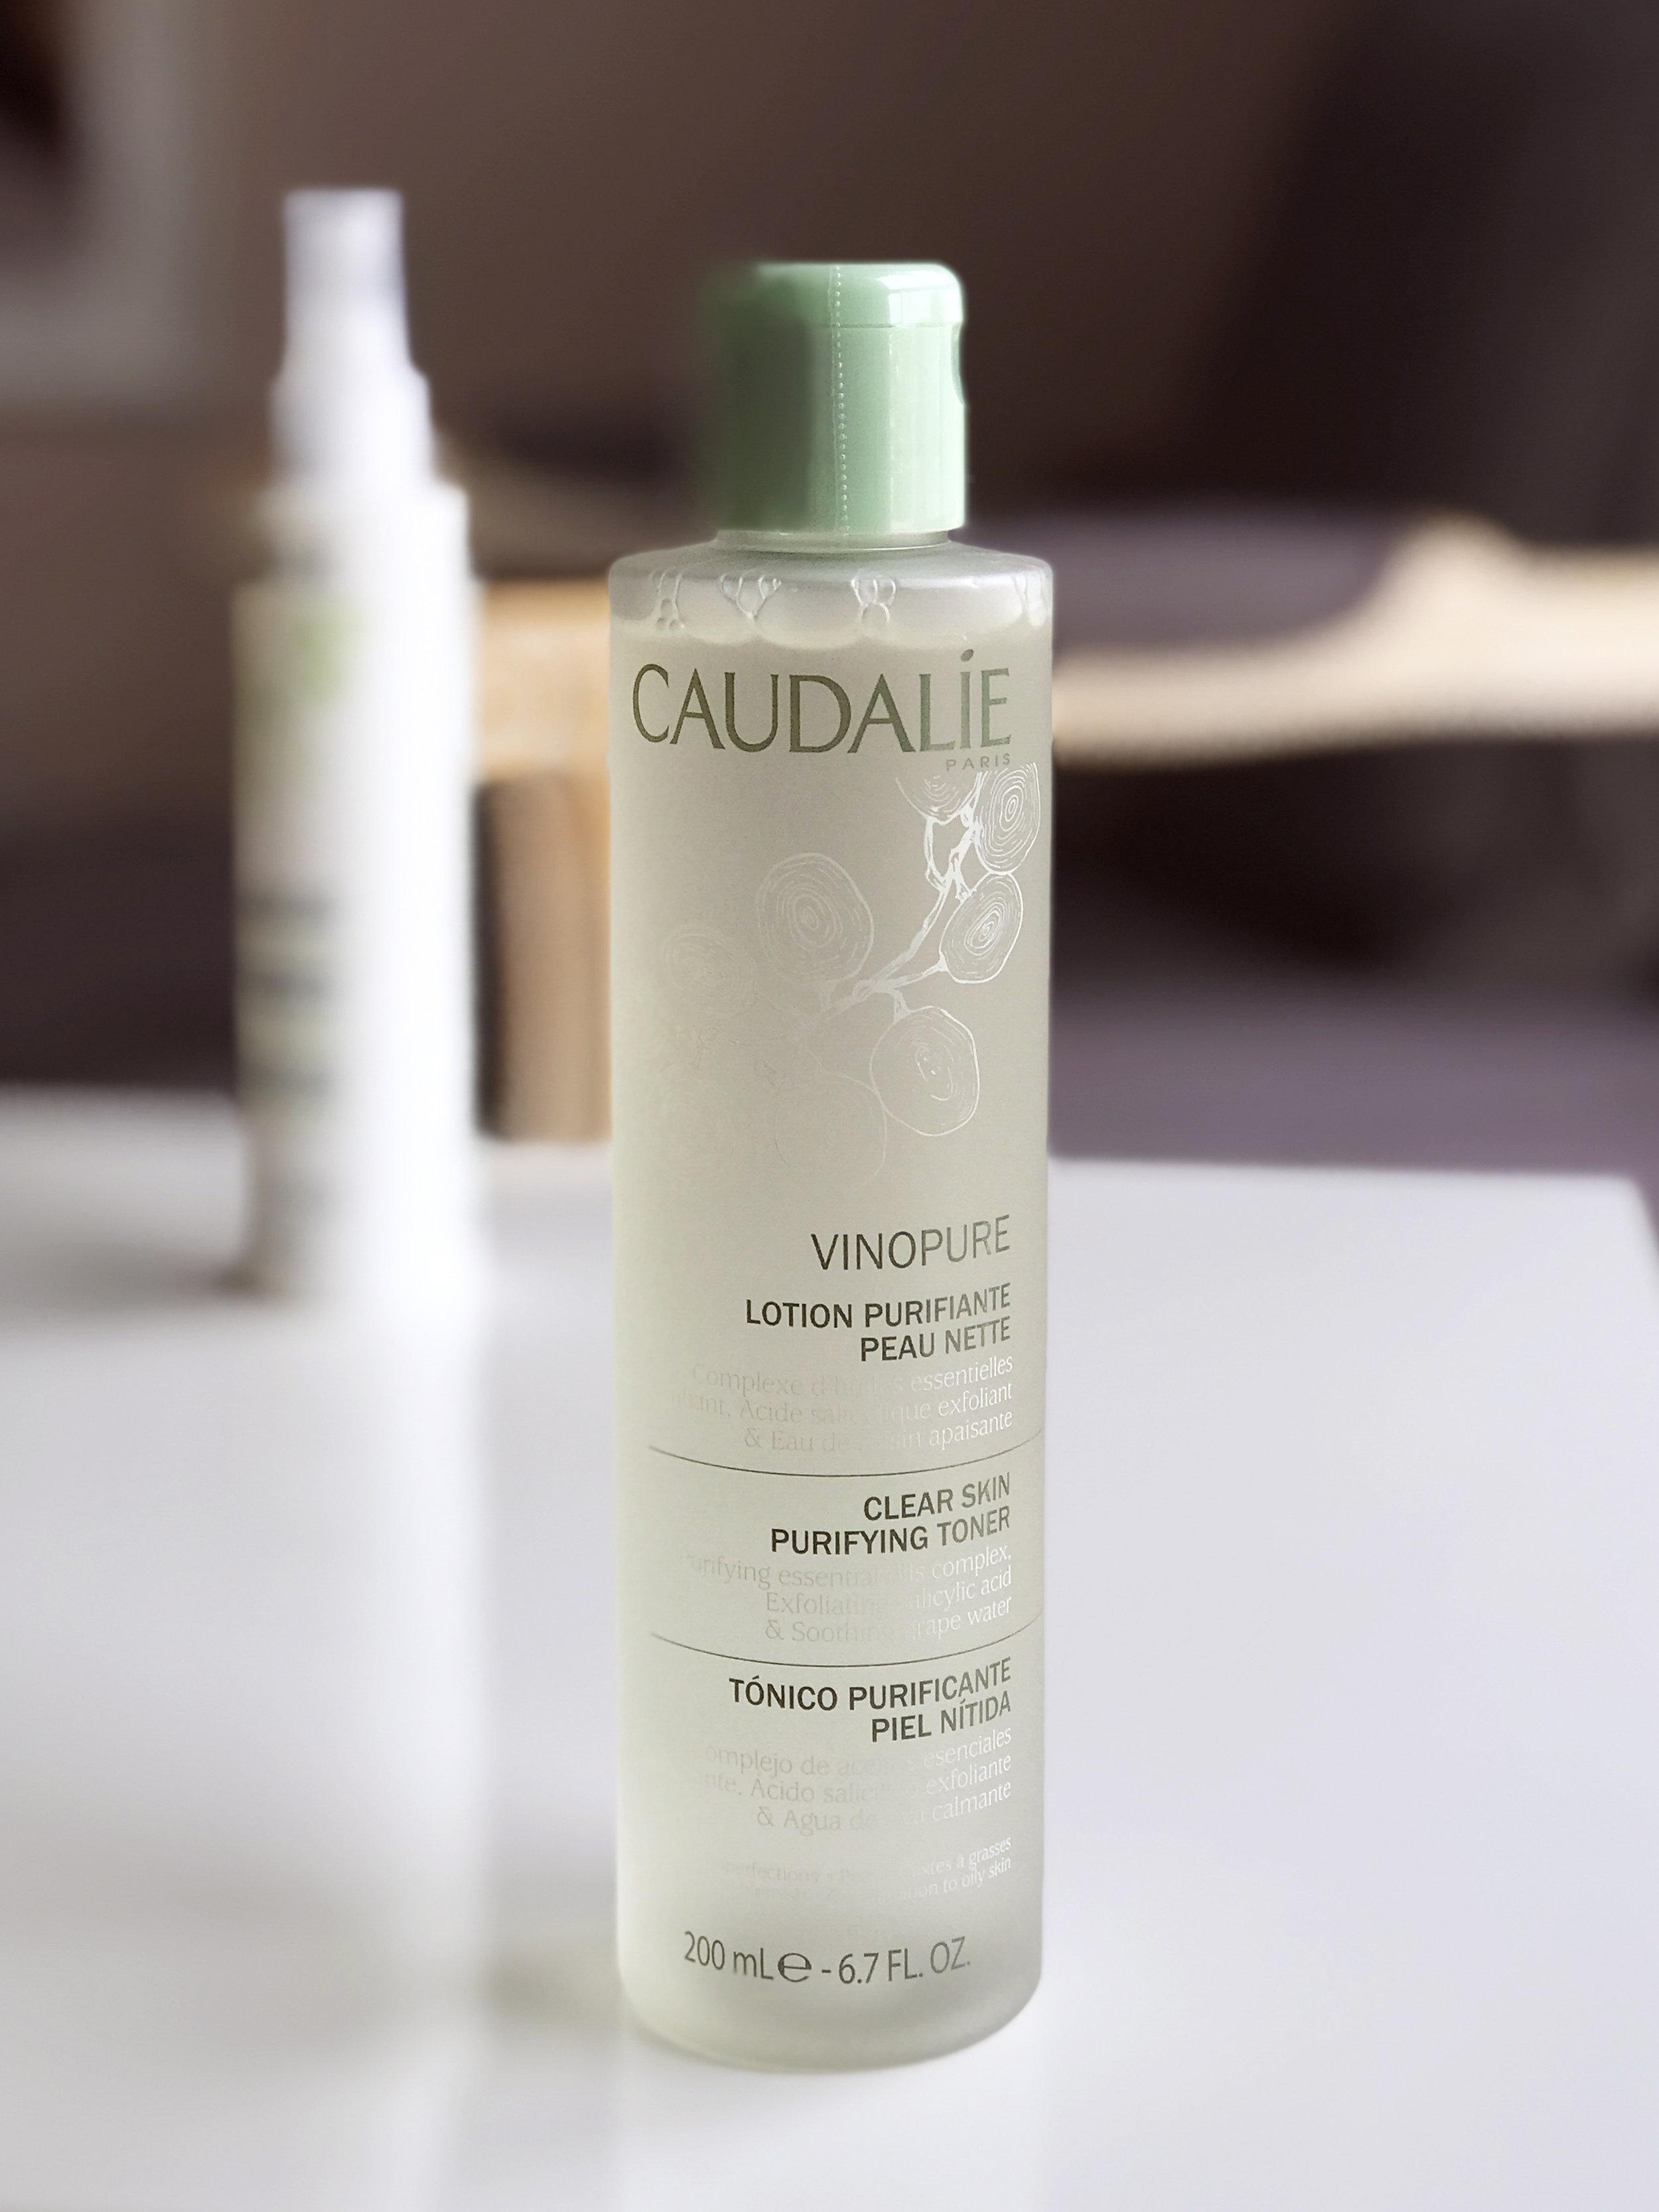 Caudalie Clear Skin Purifying Toner